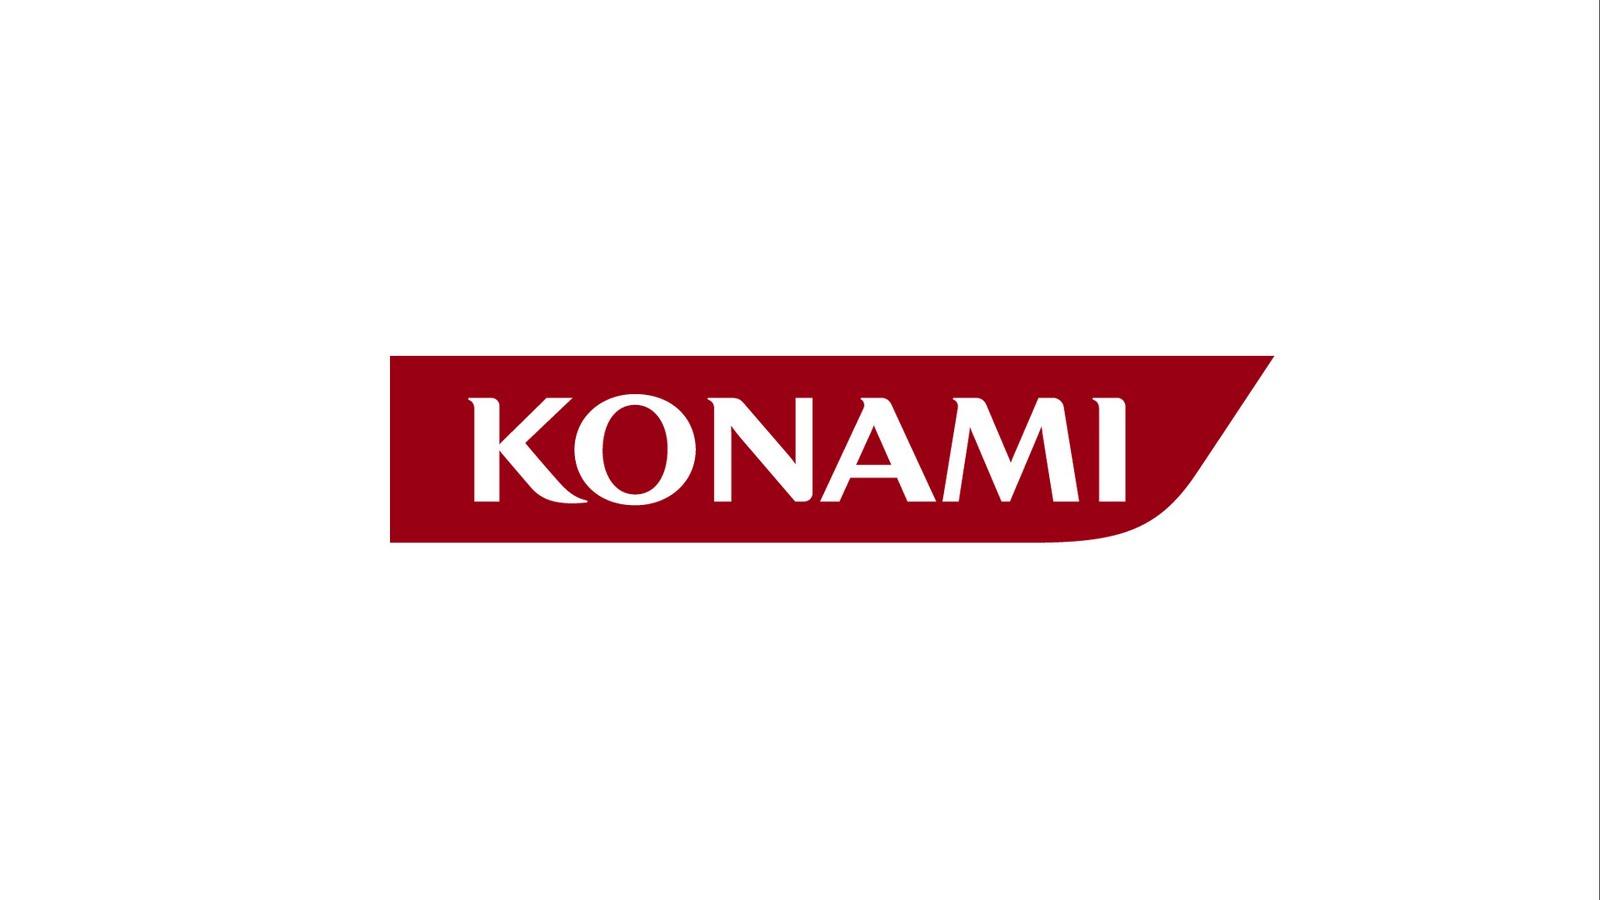 KONAMI_LOGO_001